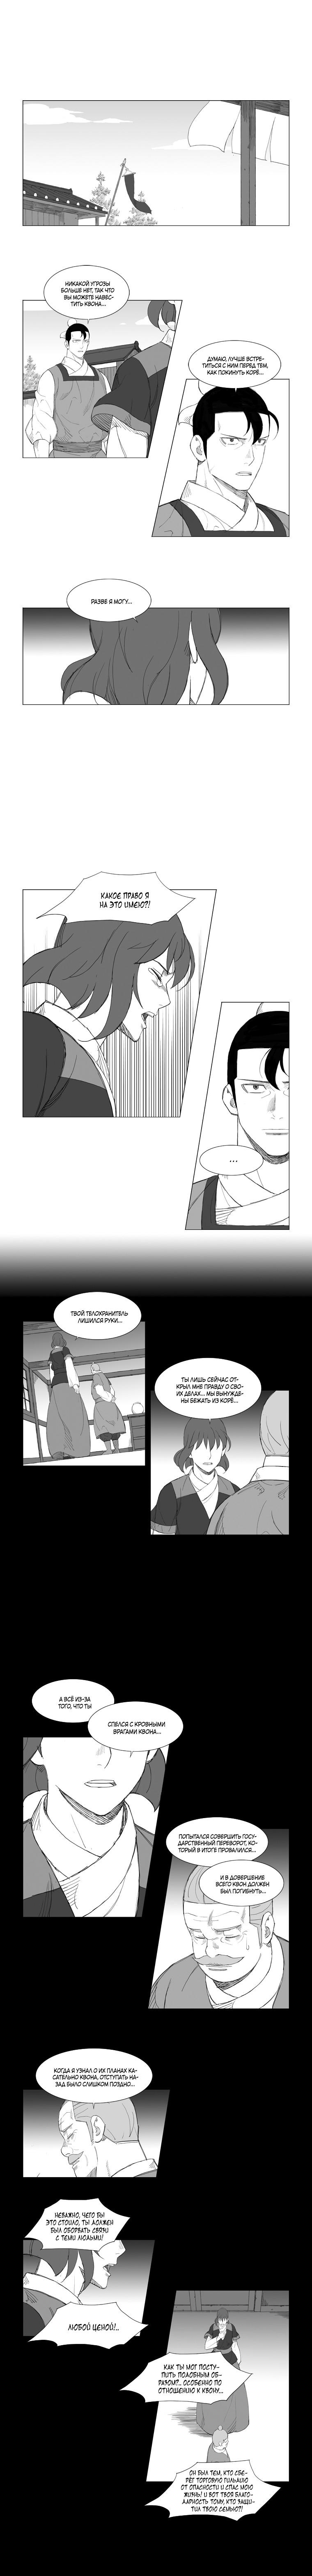 https://r1.ninemanga.com/comics/pic2/39/28263/416244/1532707536610.jpg Page 5